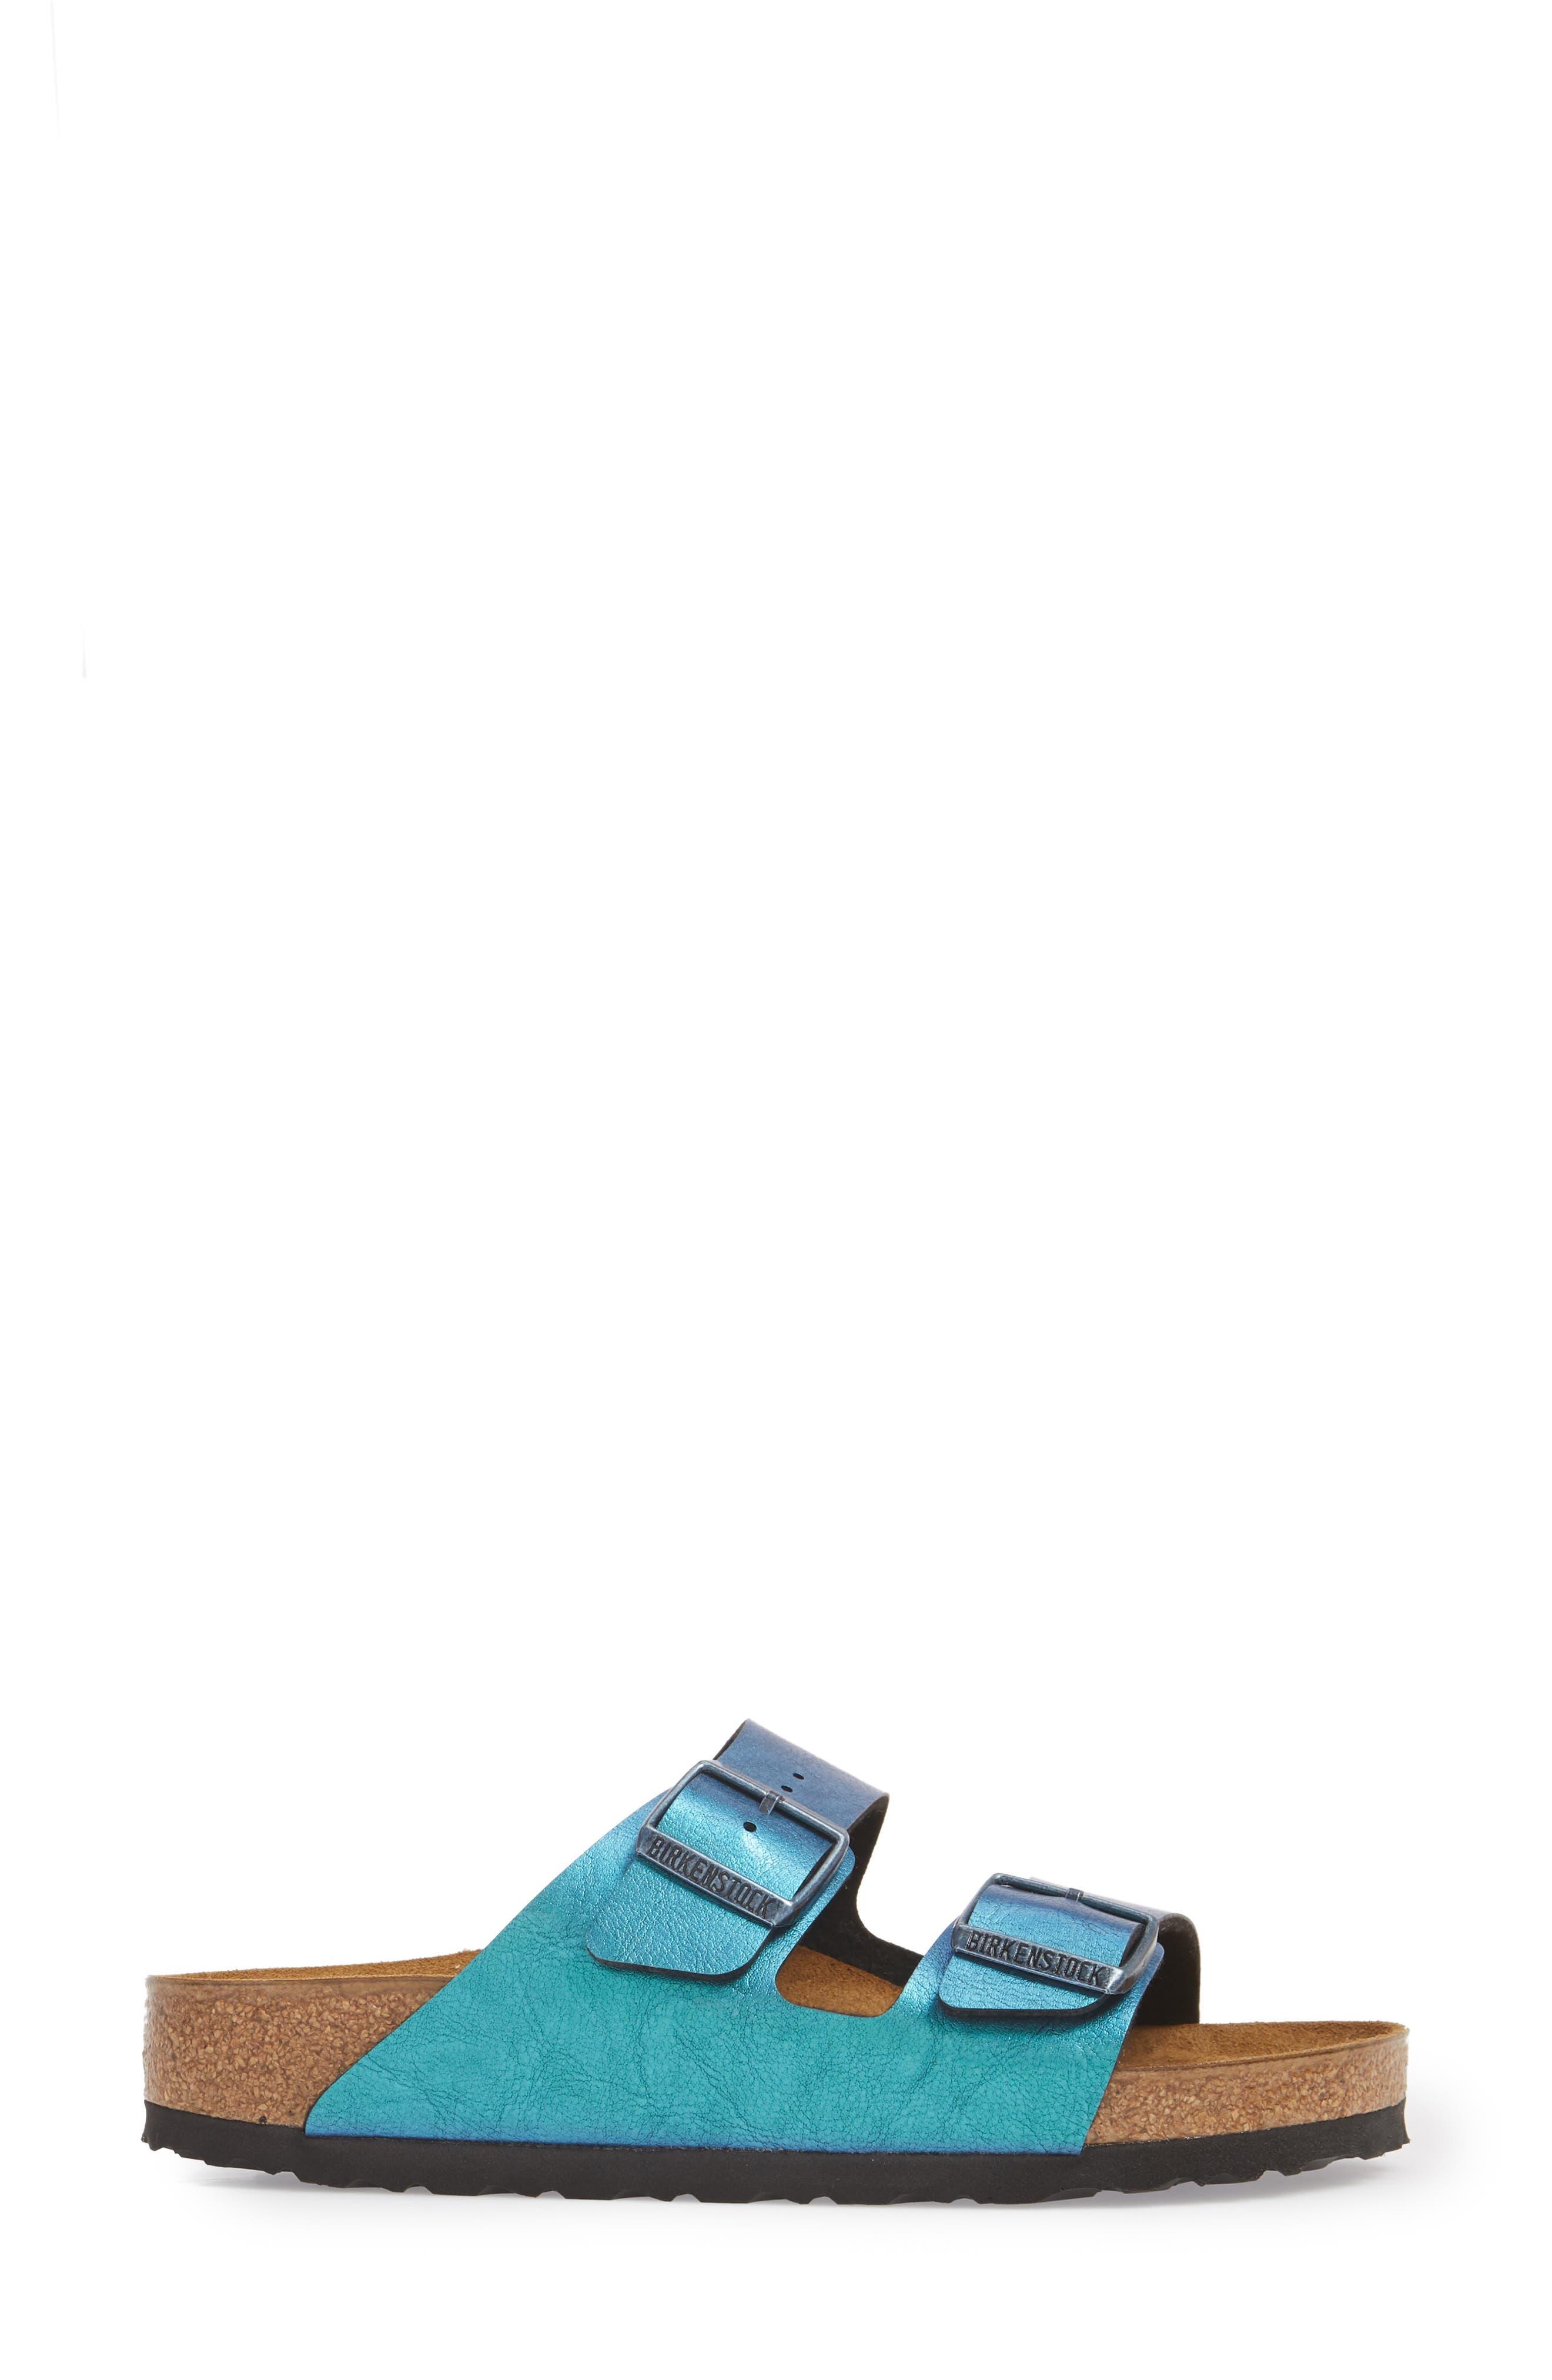 Arizona Graceful Birko-Flor<sup>™</sup> Sandal,                             Alternate thumbnail 3, color,                             400